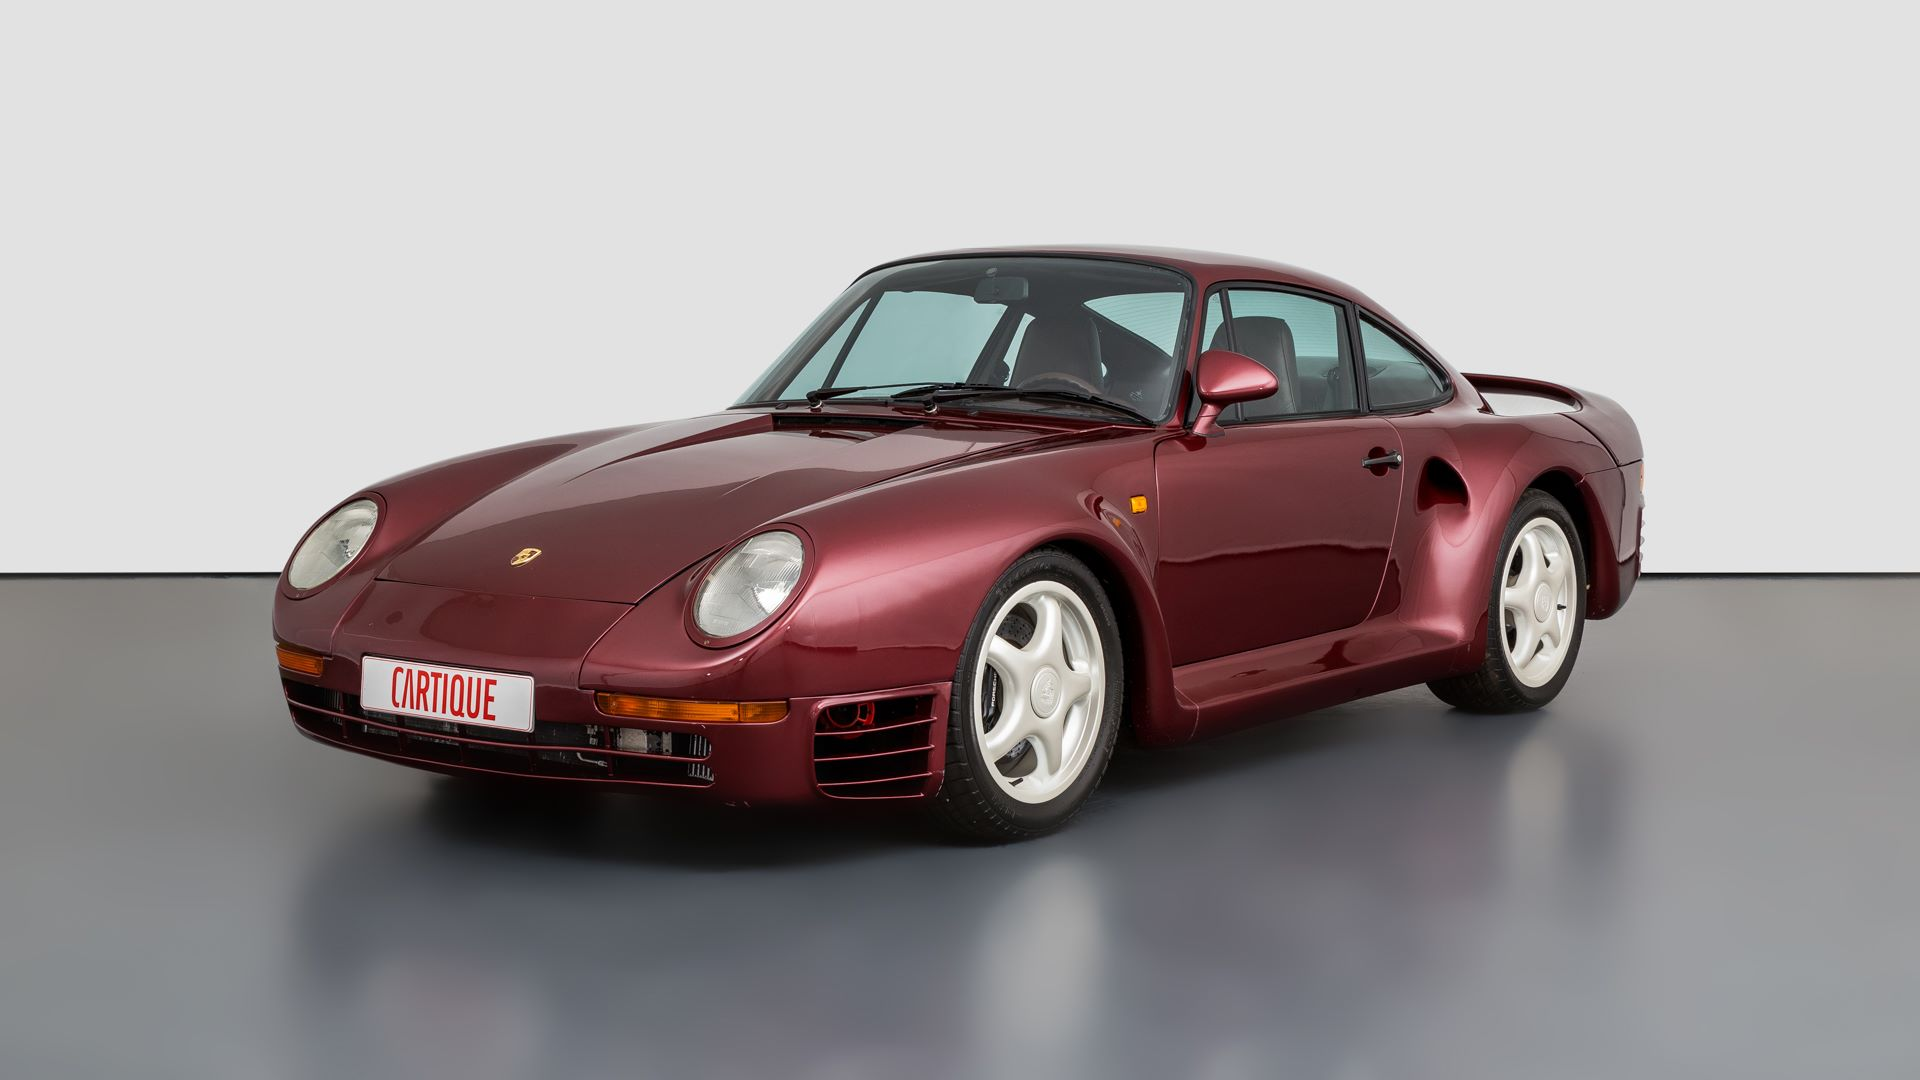 Porsche-959-Prototype-1985-for-sale-10